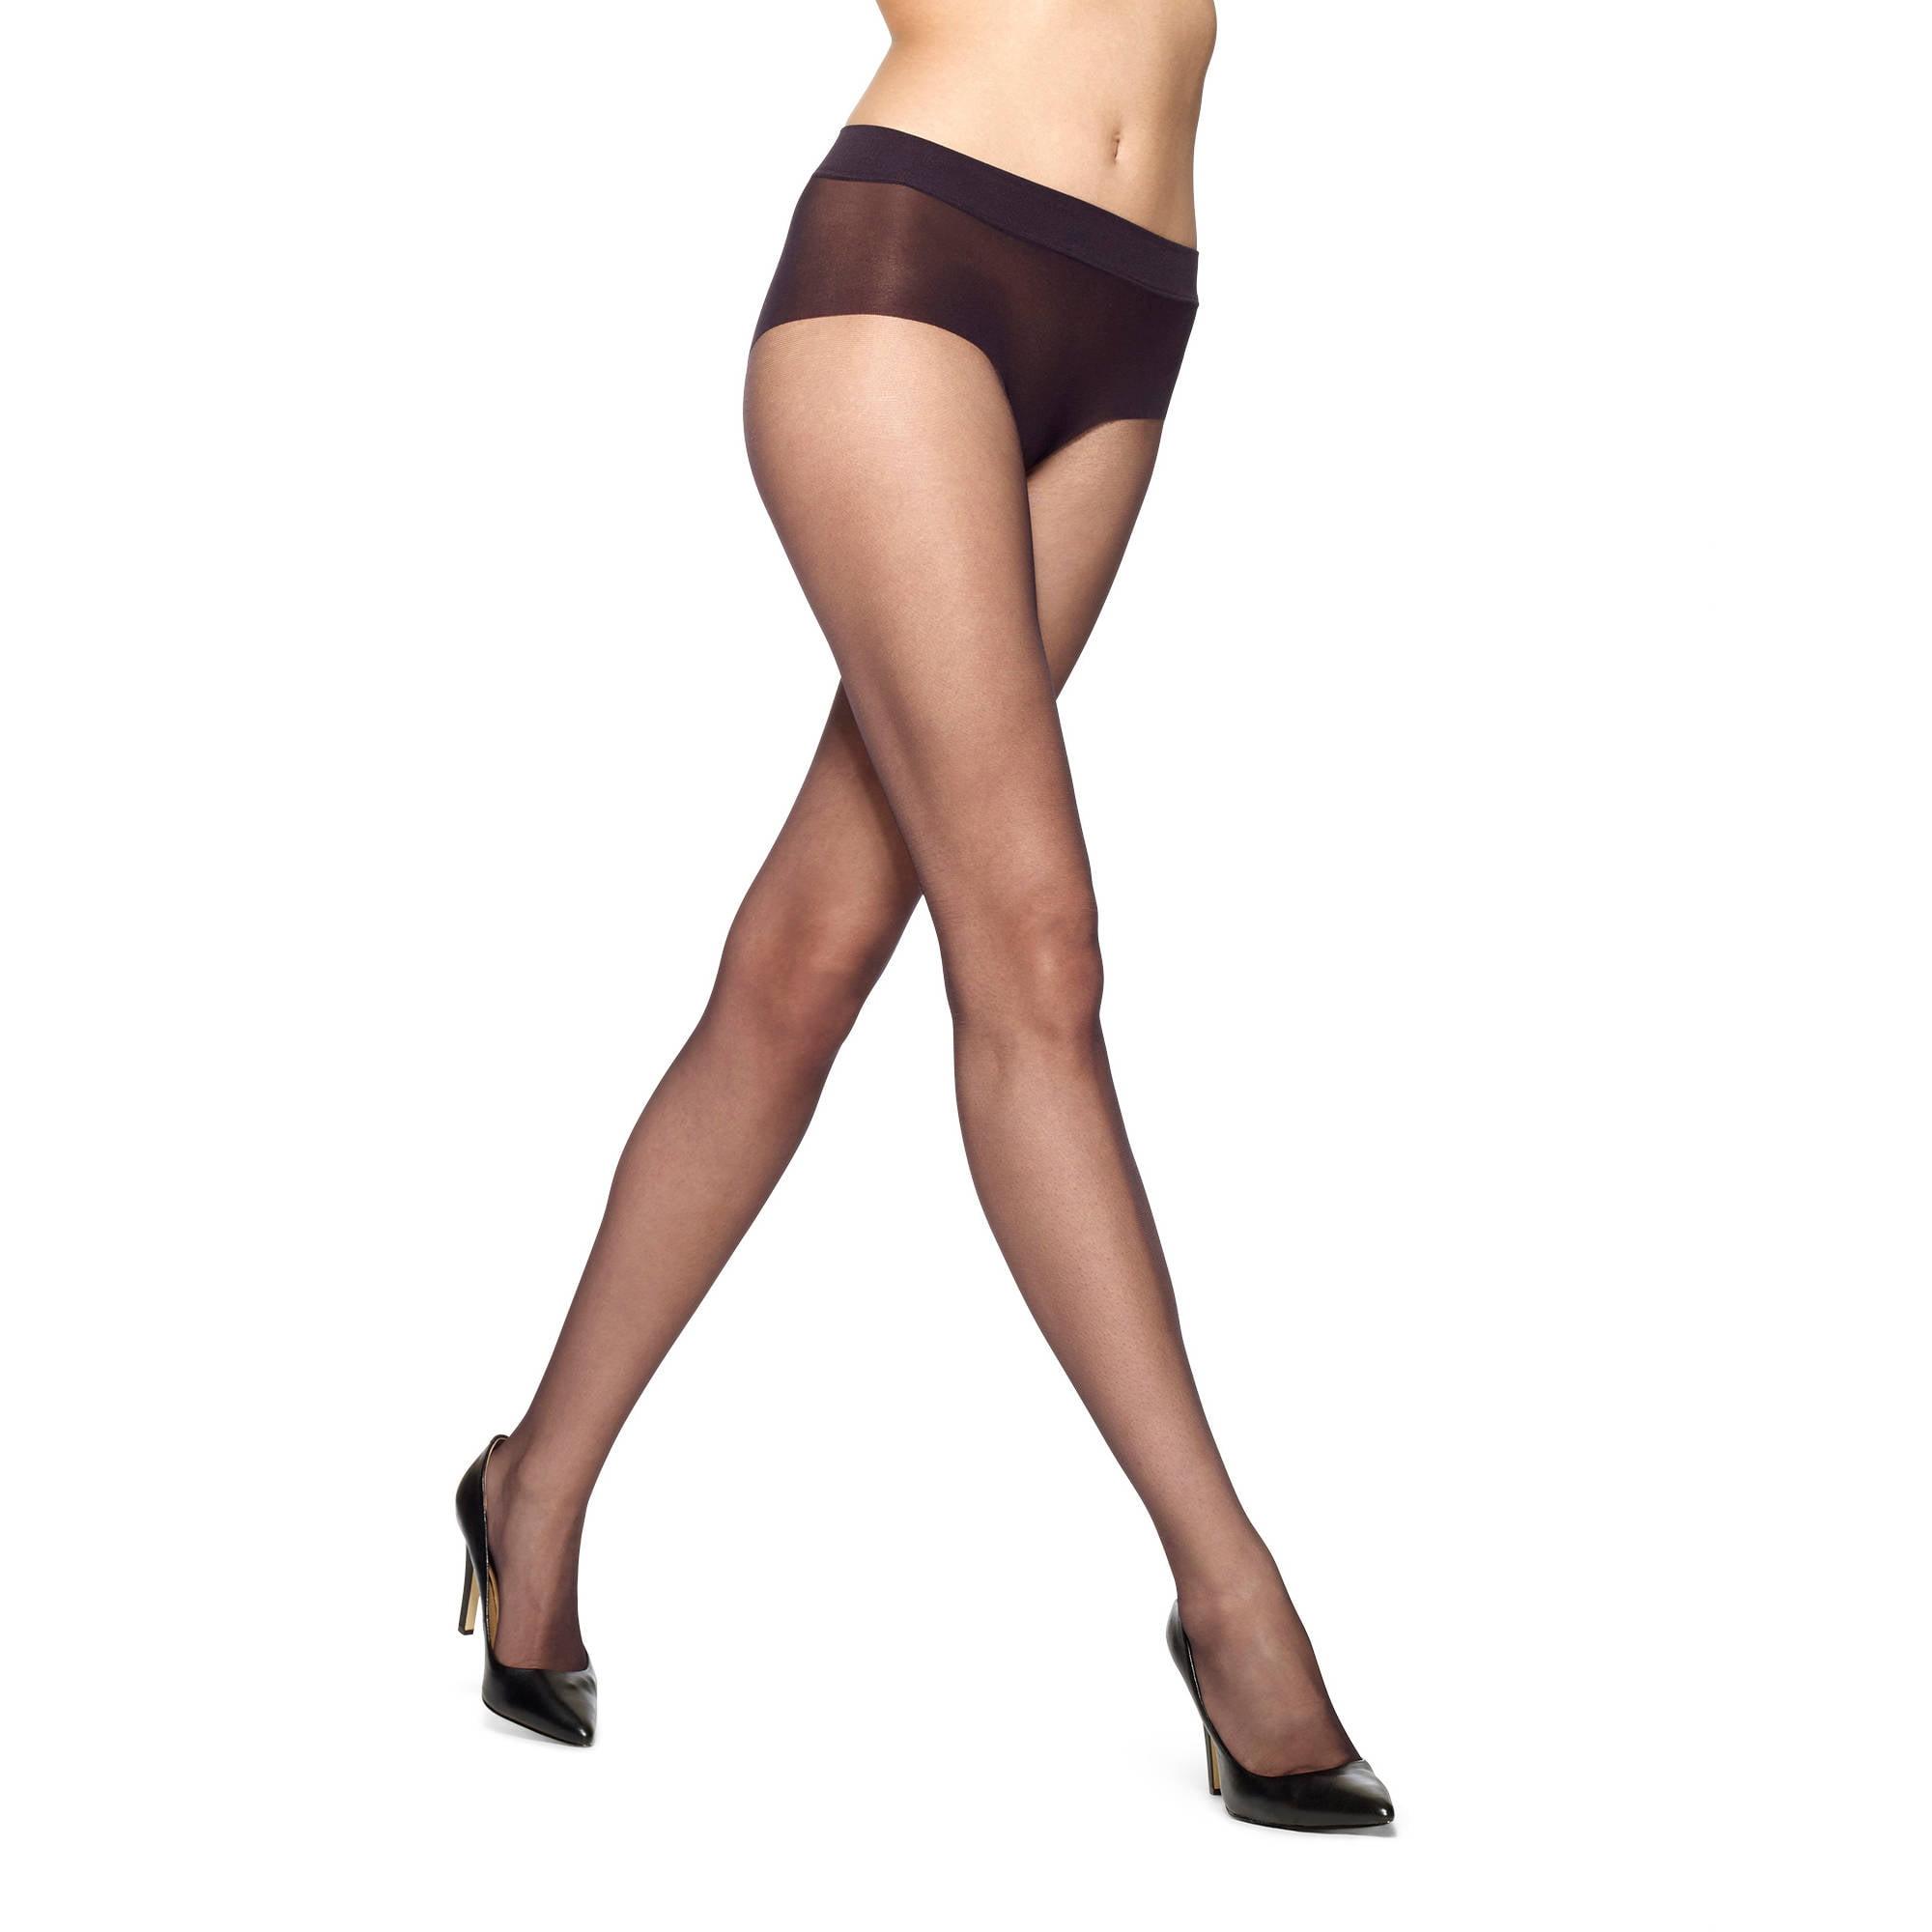 Upskirt pantyhose japanese ass